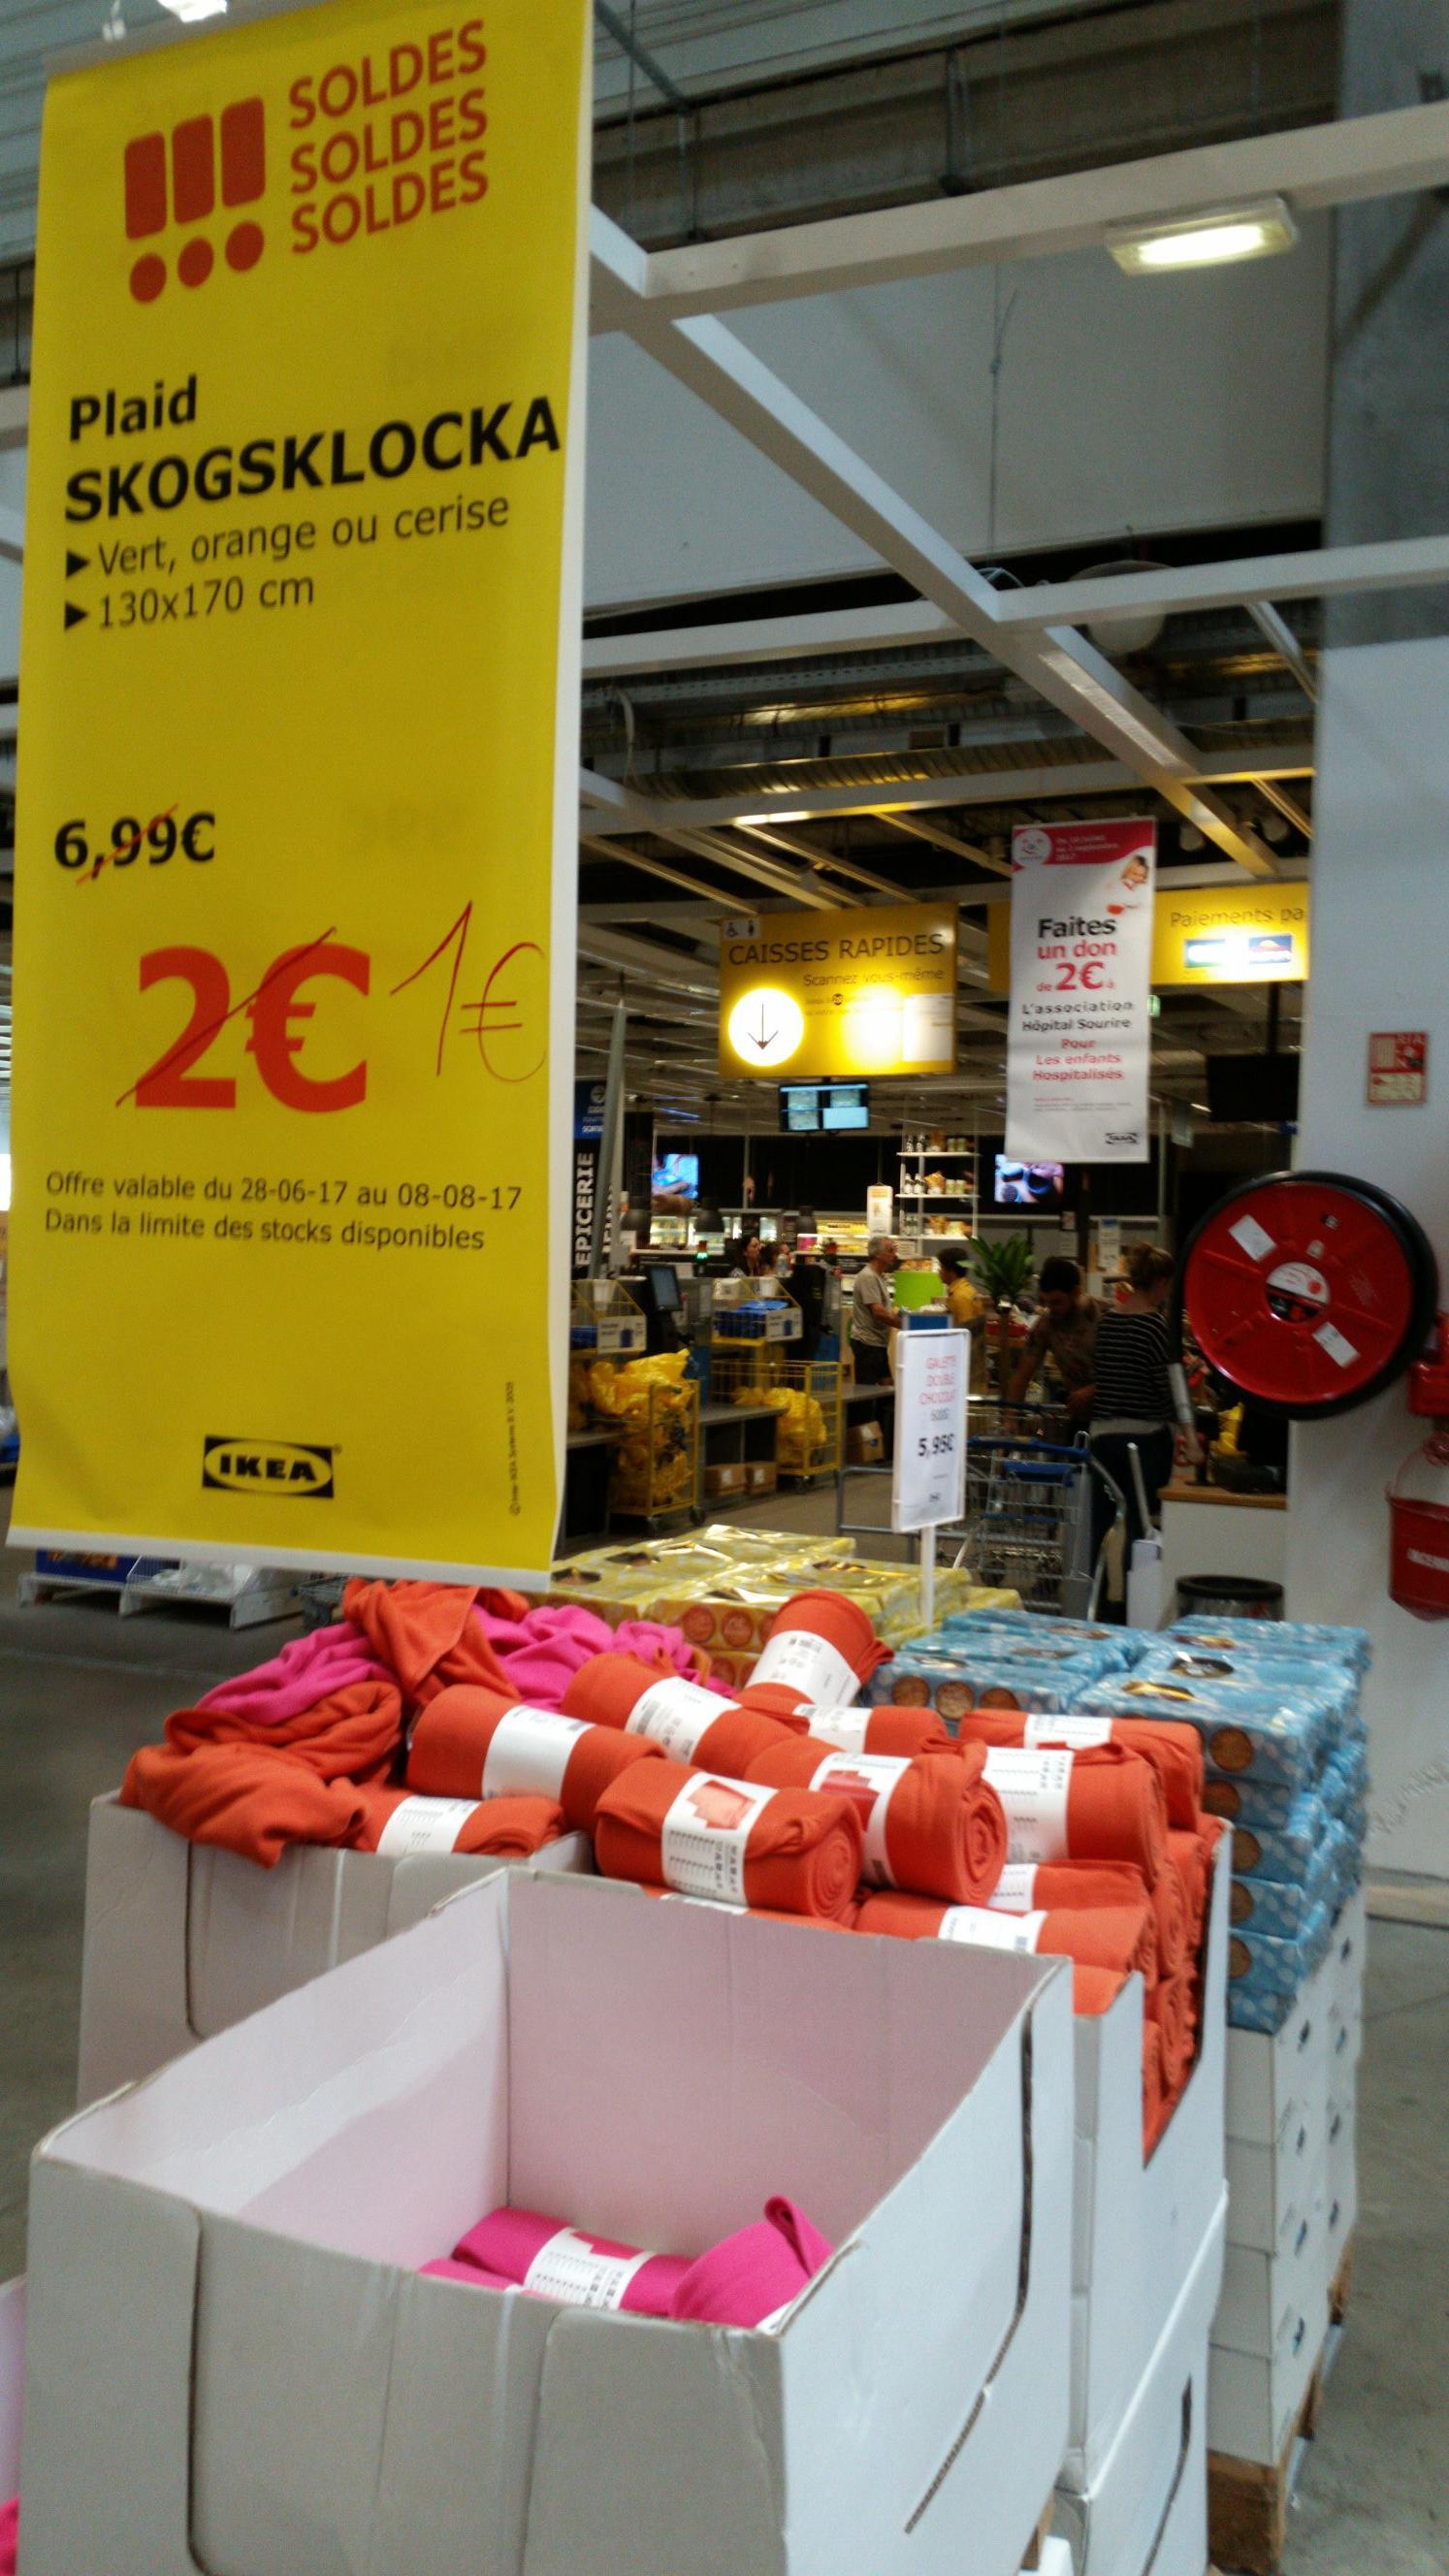 [Ikea Family] Plaid Skogsklocka - 130x170cm, Plusieurs coloris